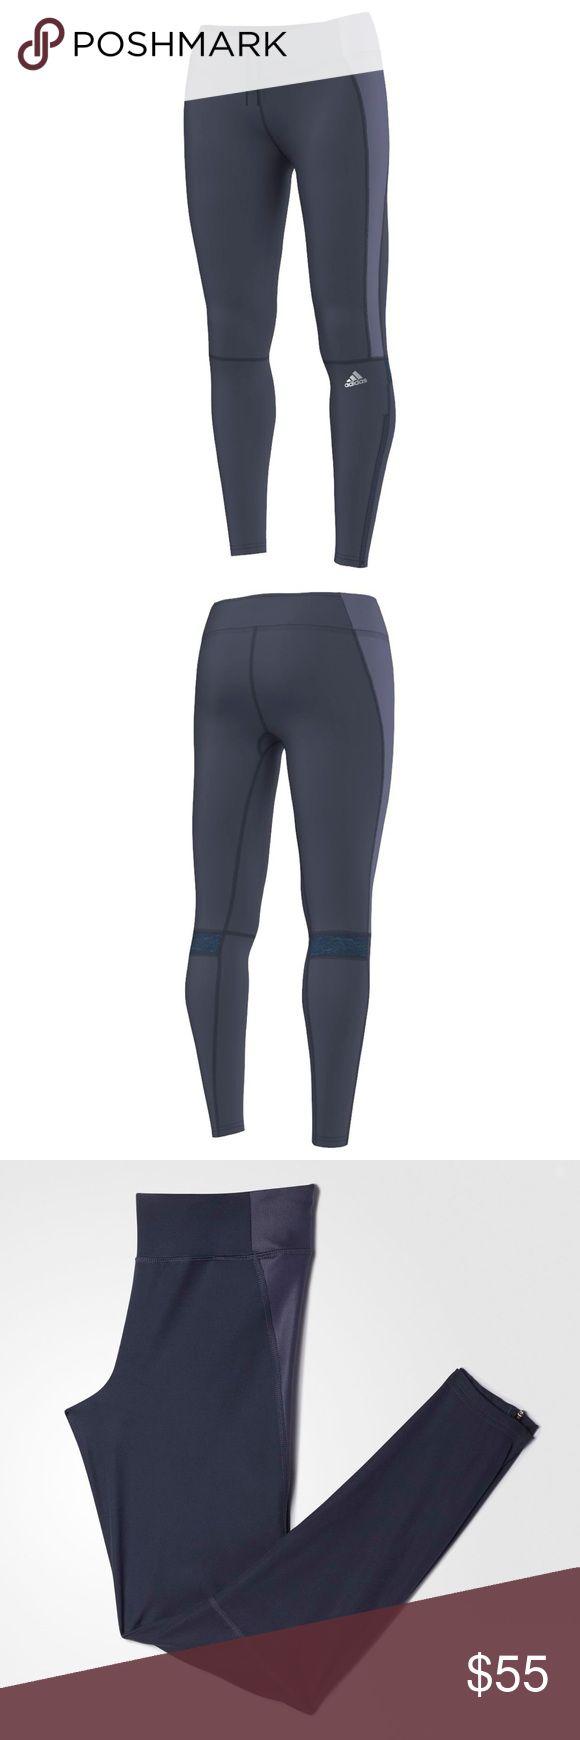 Adidas supernova leggings Brand new never worn supernova leggings. Super cute style and color Adidas Pants Leggings